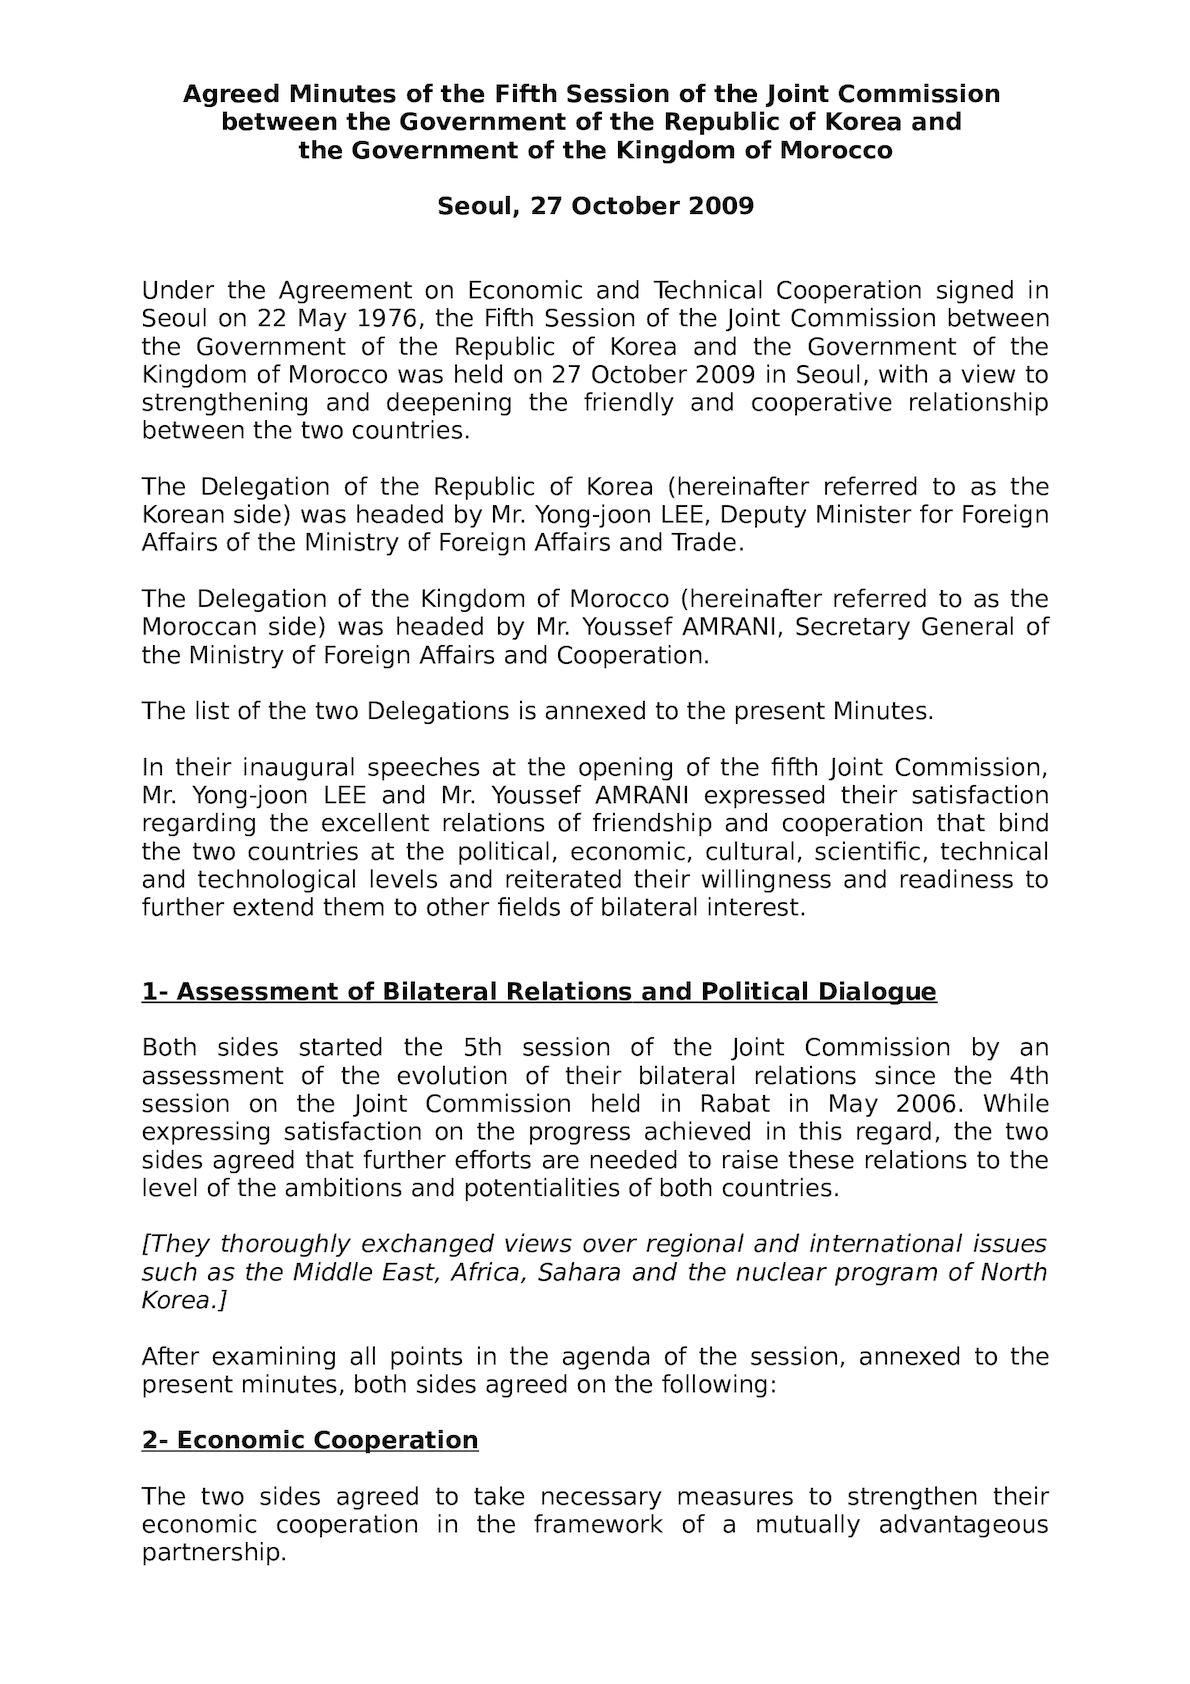 Agreed Minuites Revised By Korea Embassy